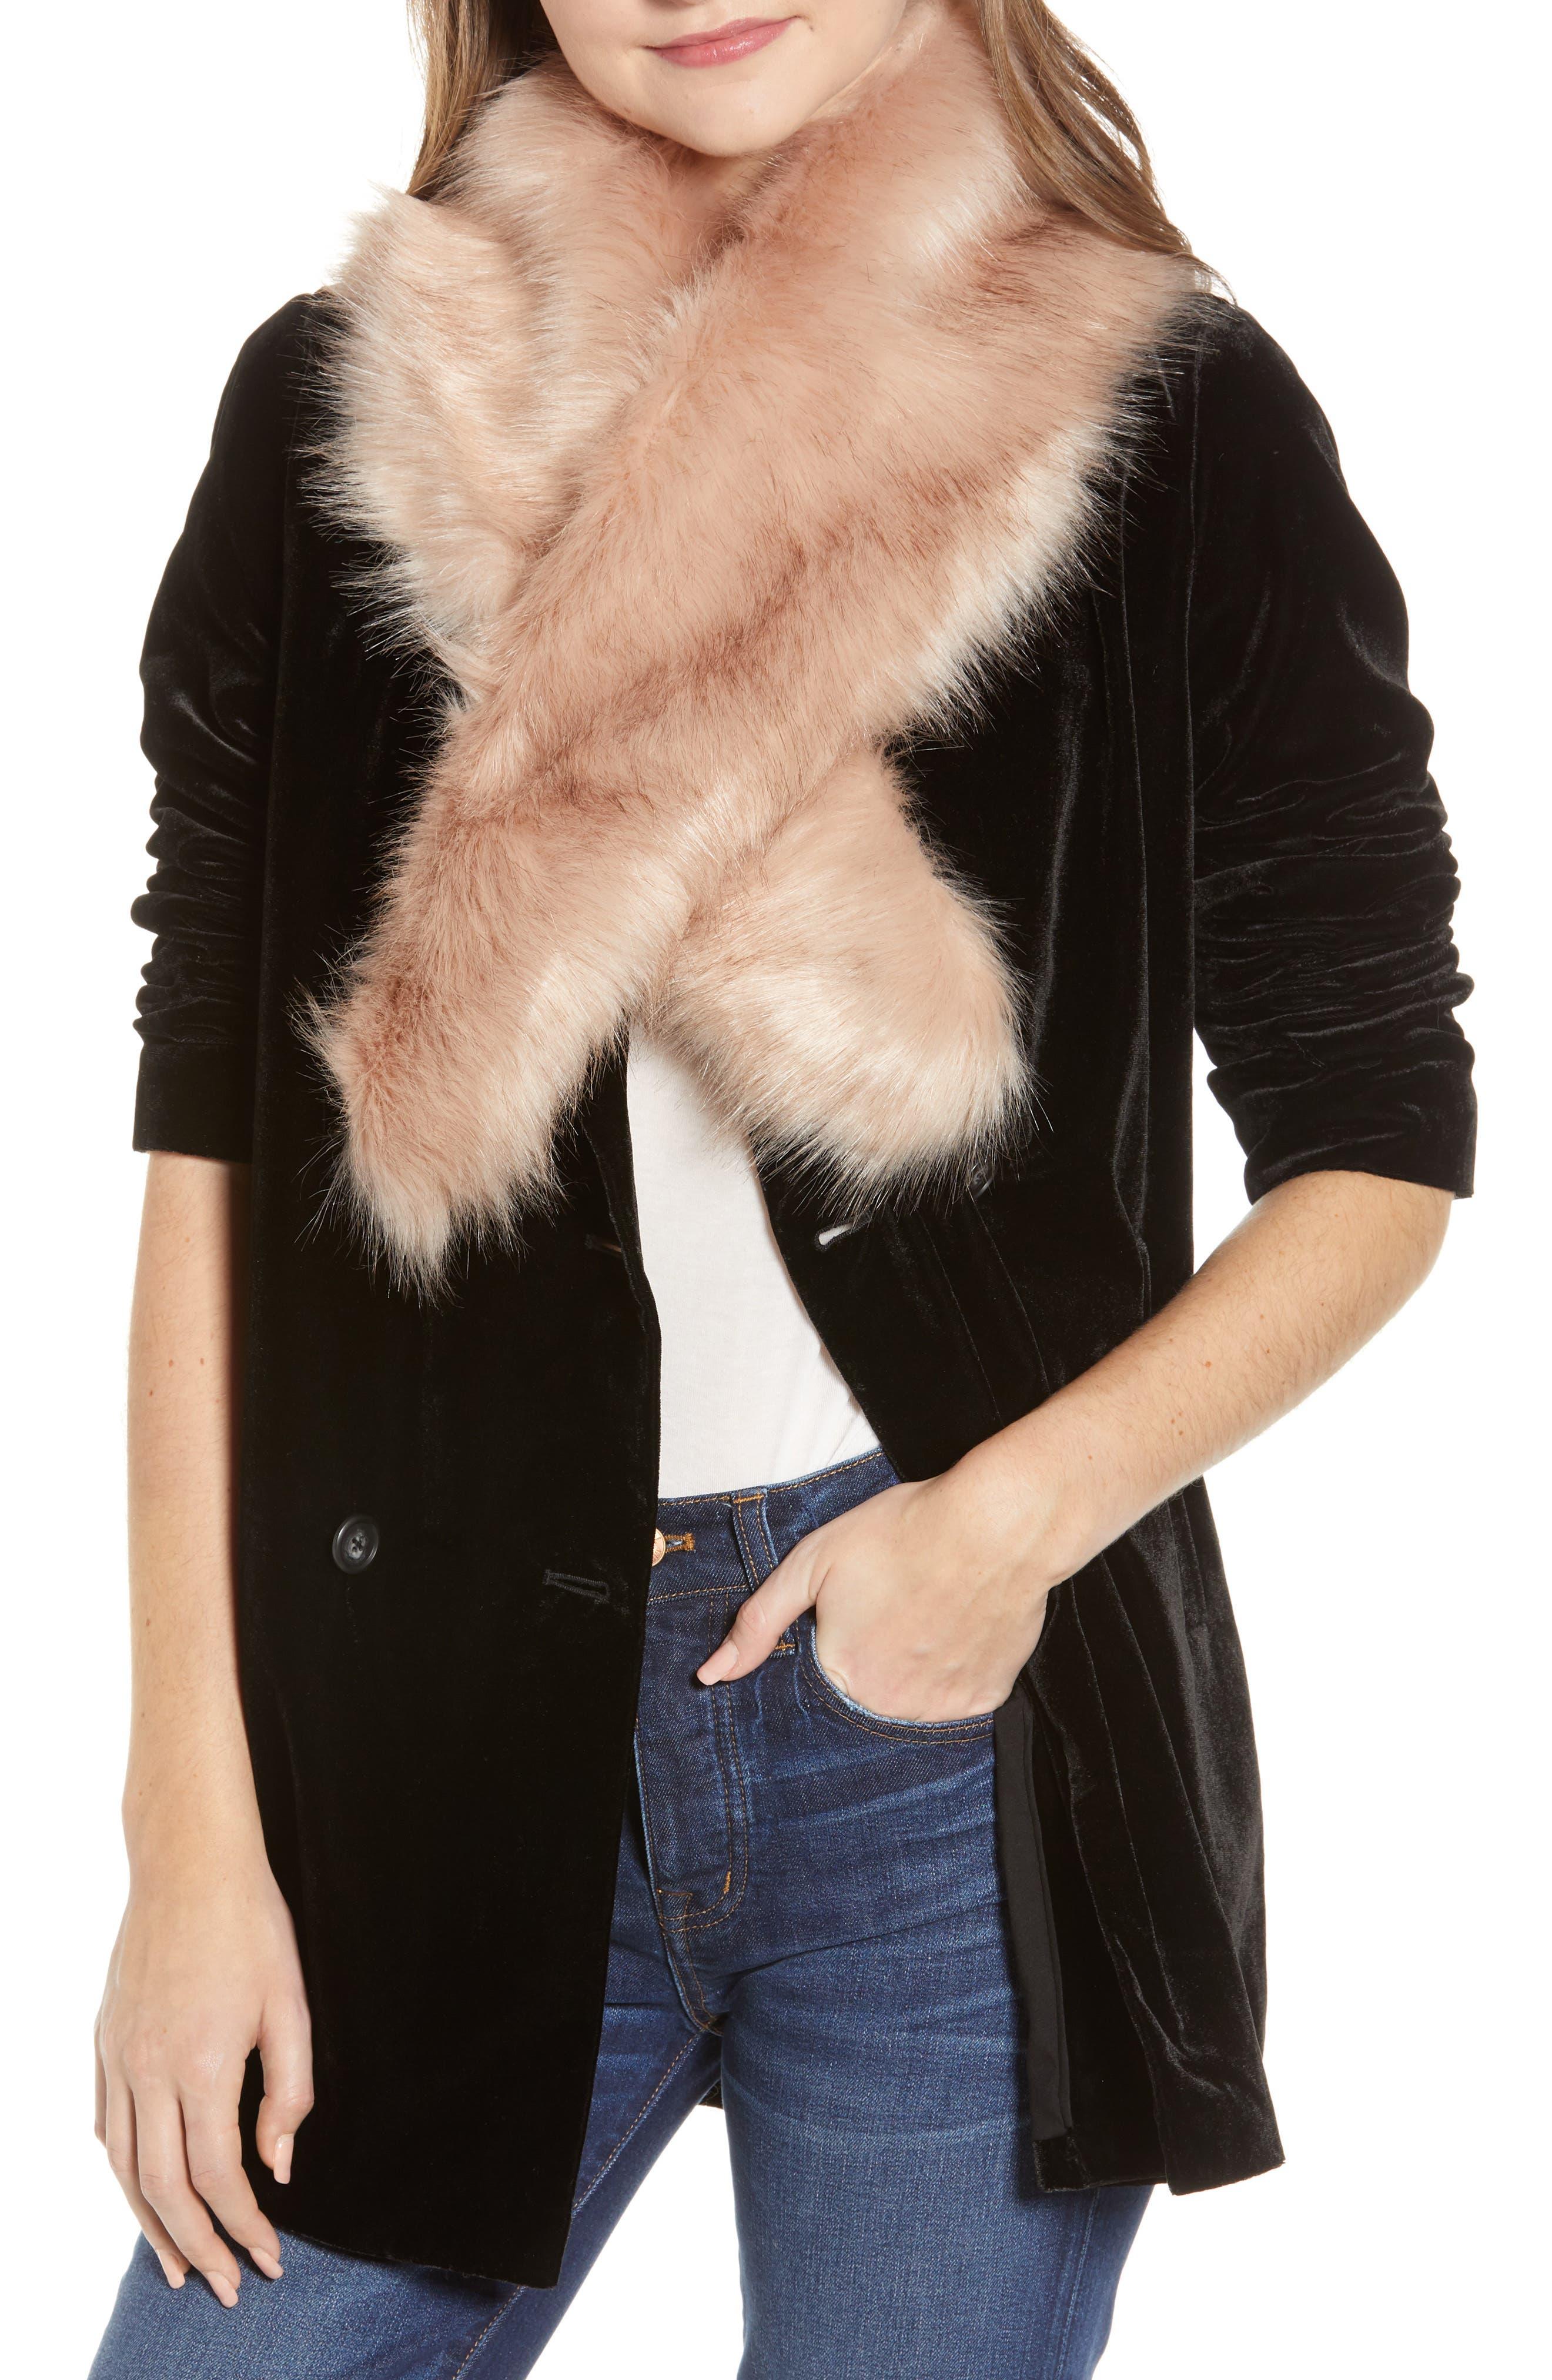 SOLE SOCIETY Faux Fur Stole, Main, color, BLUSH